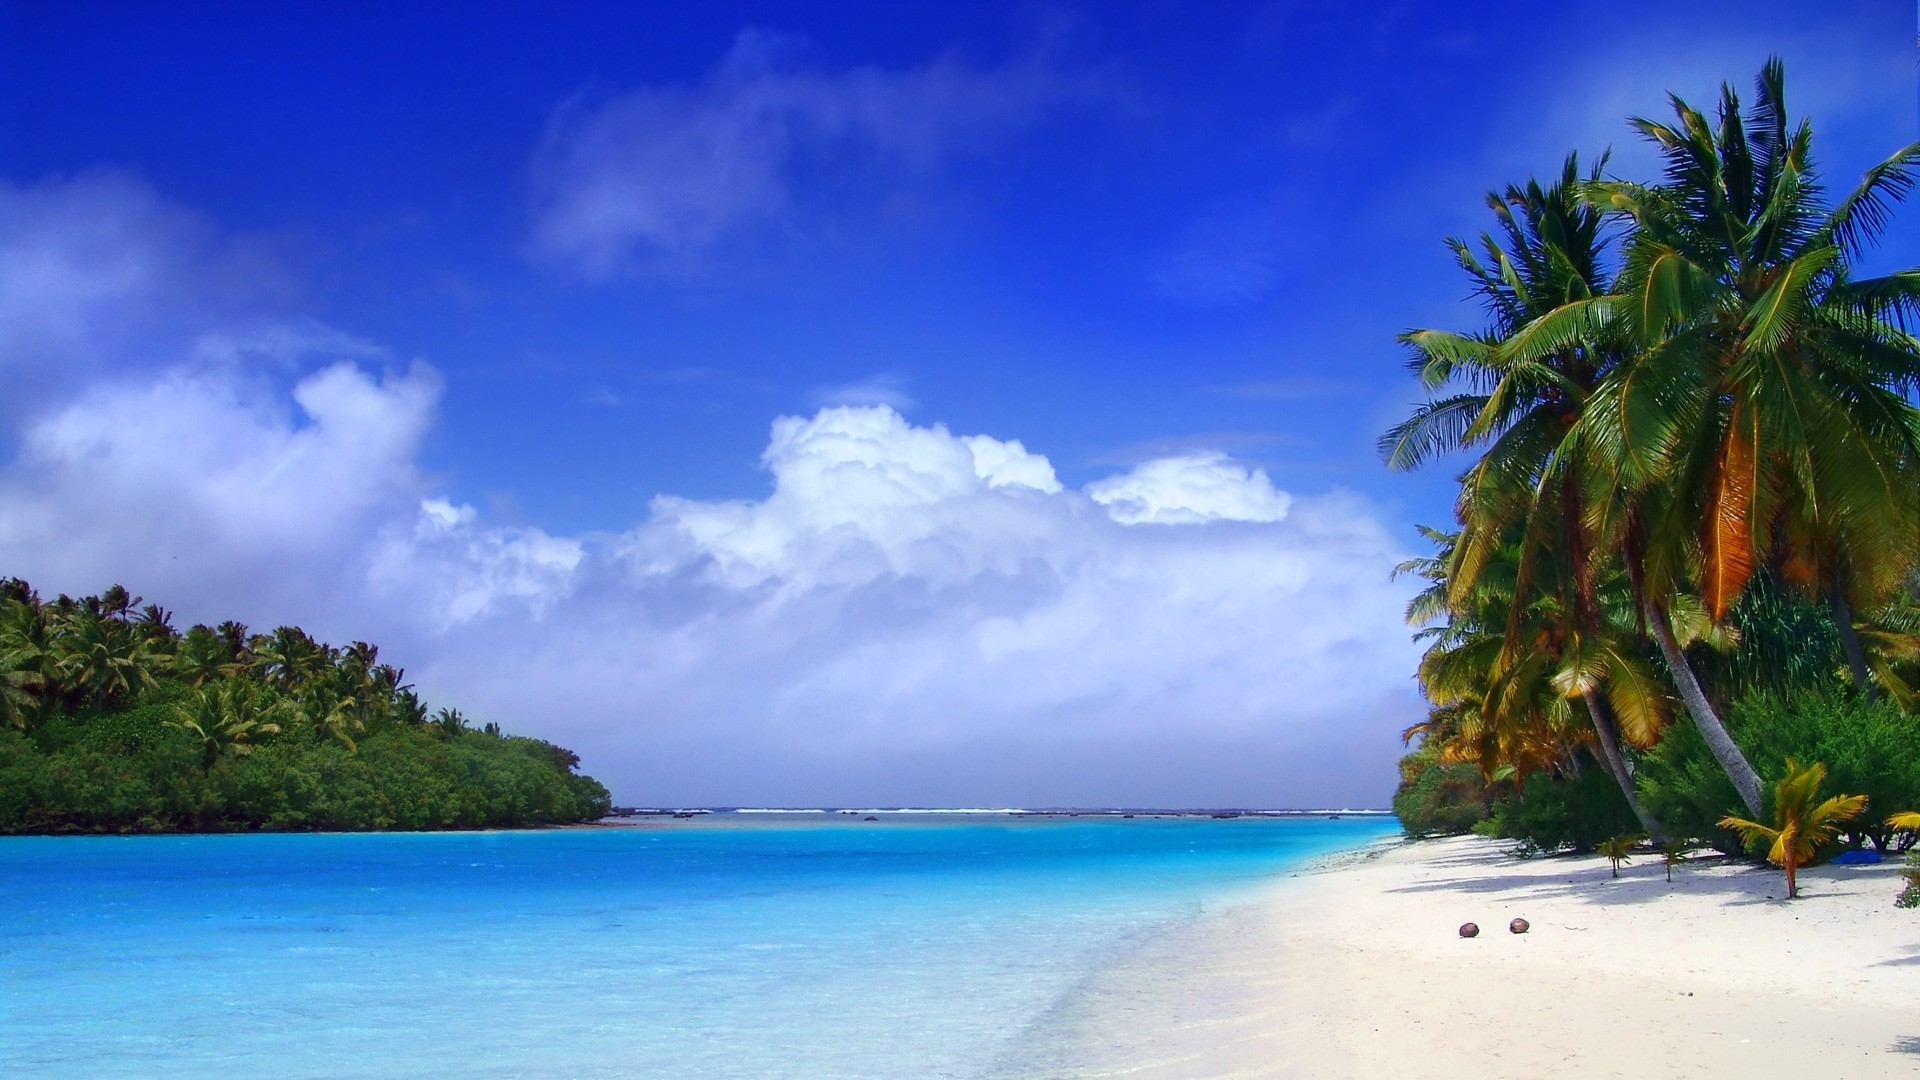 Wallpaper beach, tropics, sea, sand, palm trees, clouds